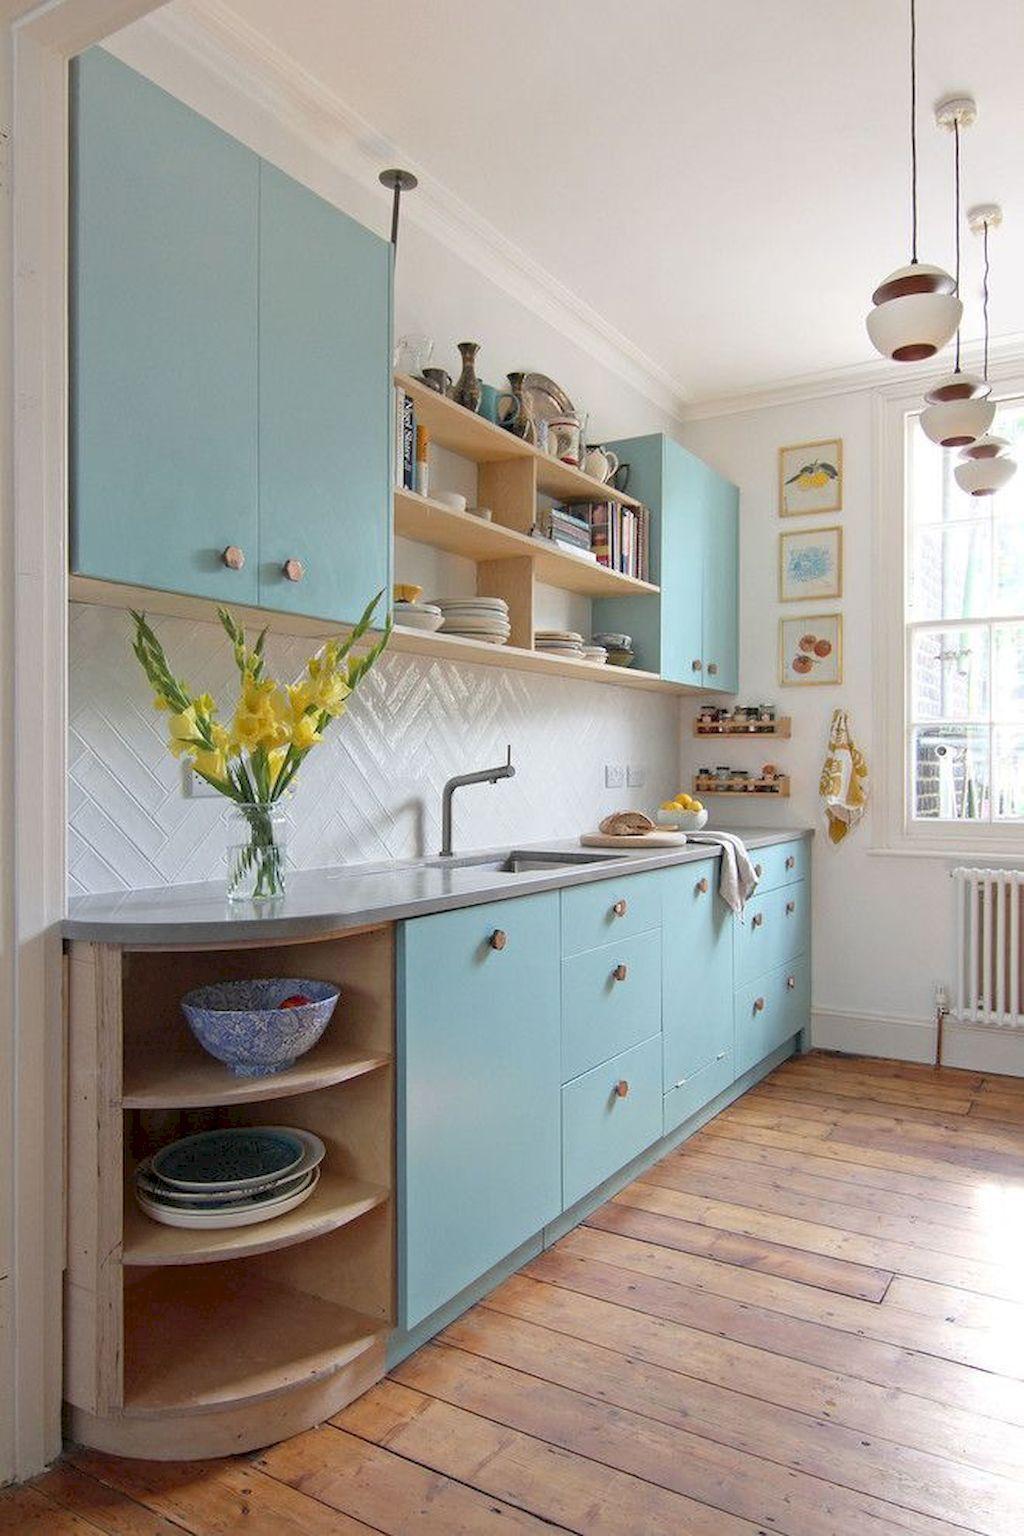 kitchen, wooden floor, white herringbone backsplash, blue kitchen cabinet, wooden shelves, grey top